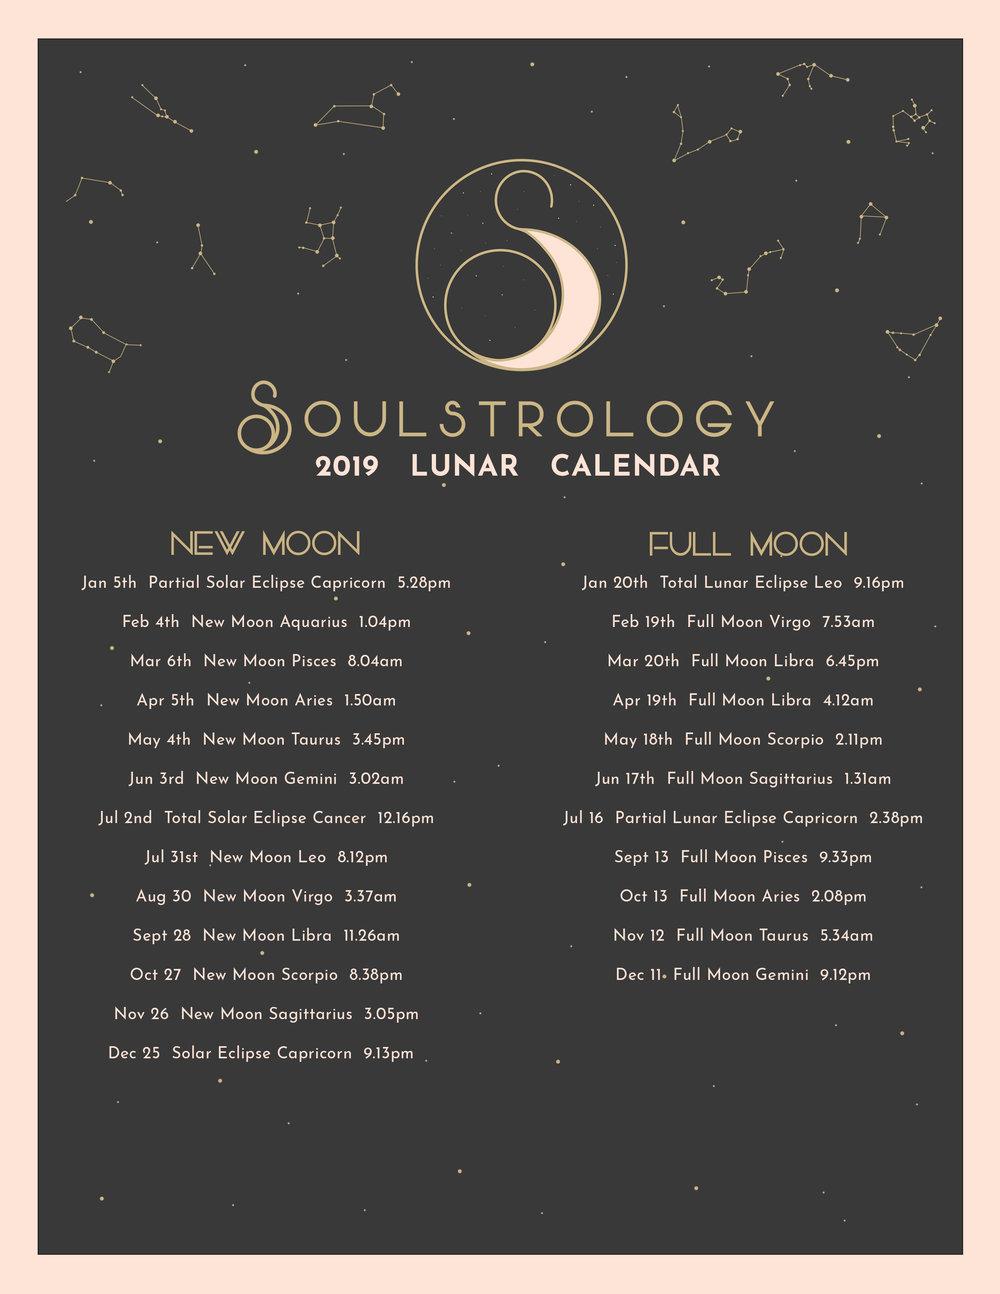 soulstrology_lunar_calendar.jpg